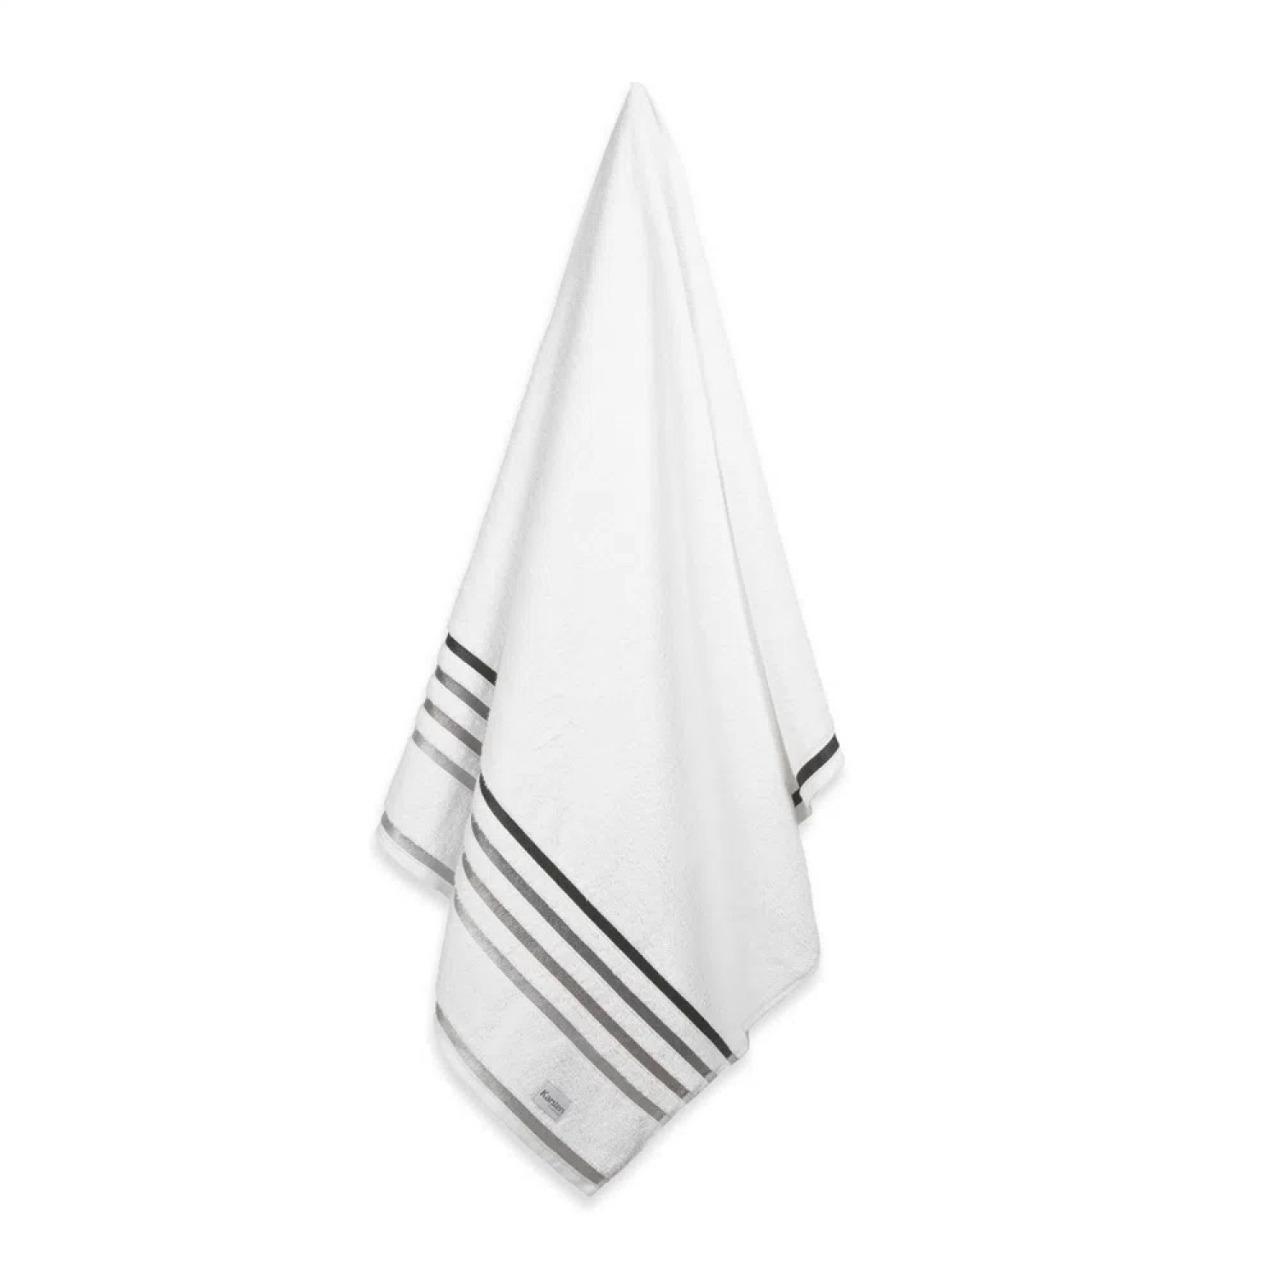 Toalha de Rosto Fio Penteado Lumina Karsten - Branca